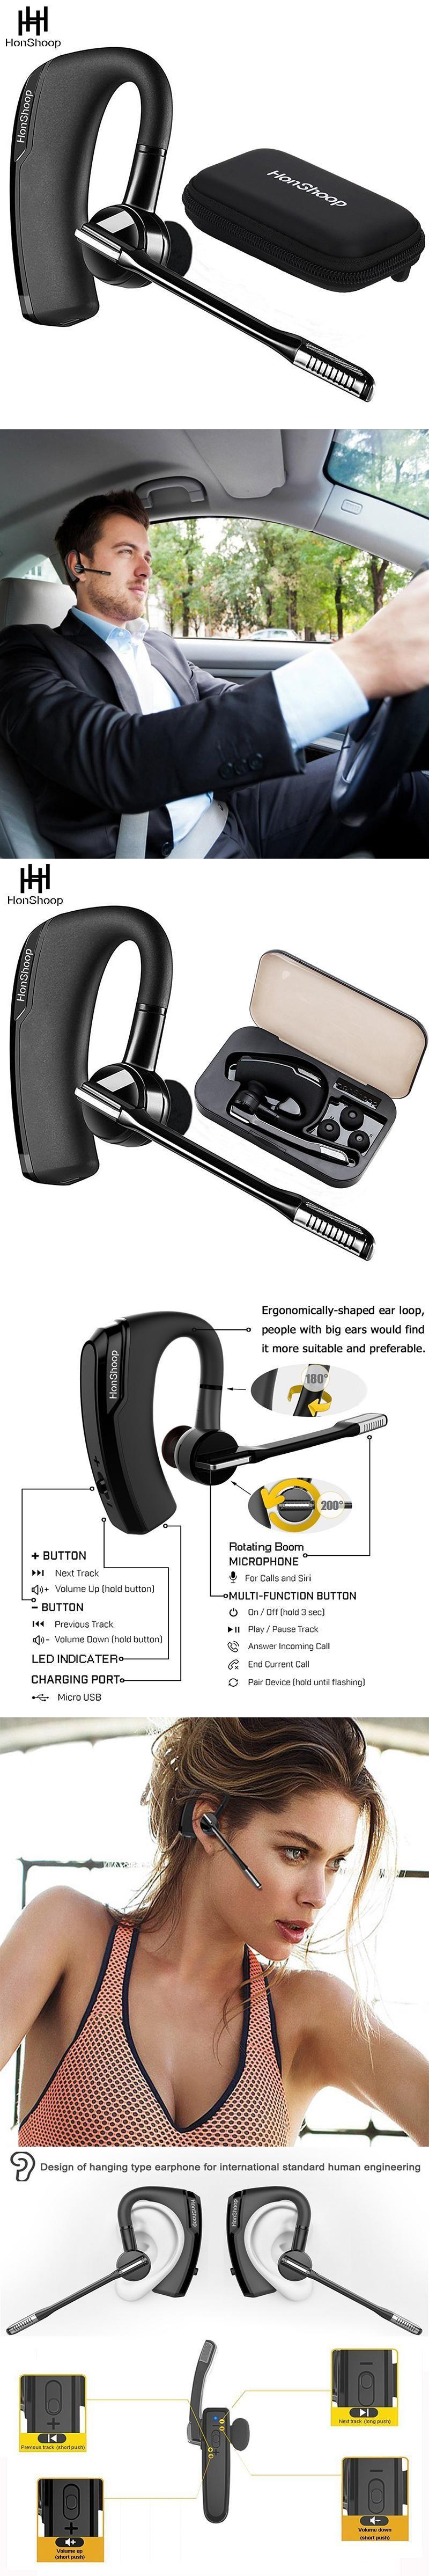 K6 Voyager Legend Bluetooth Headset Handsfree Wireless Stereo 41 Car Headphones A Gift Earphones Carrying